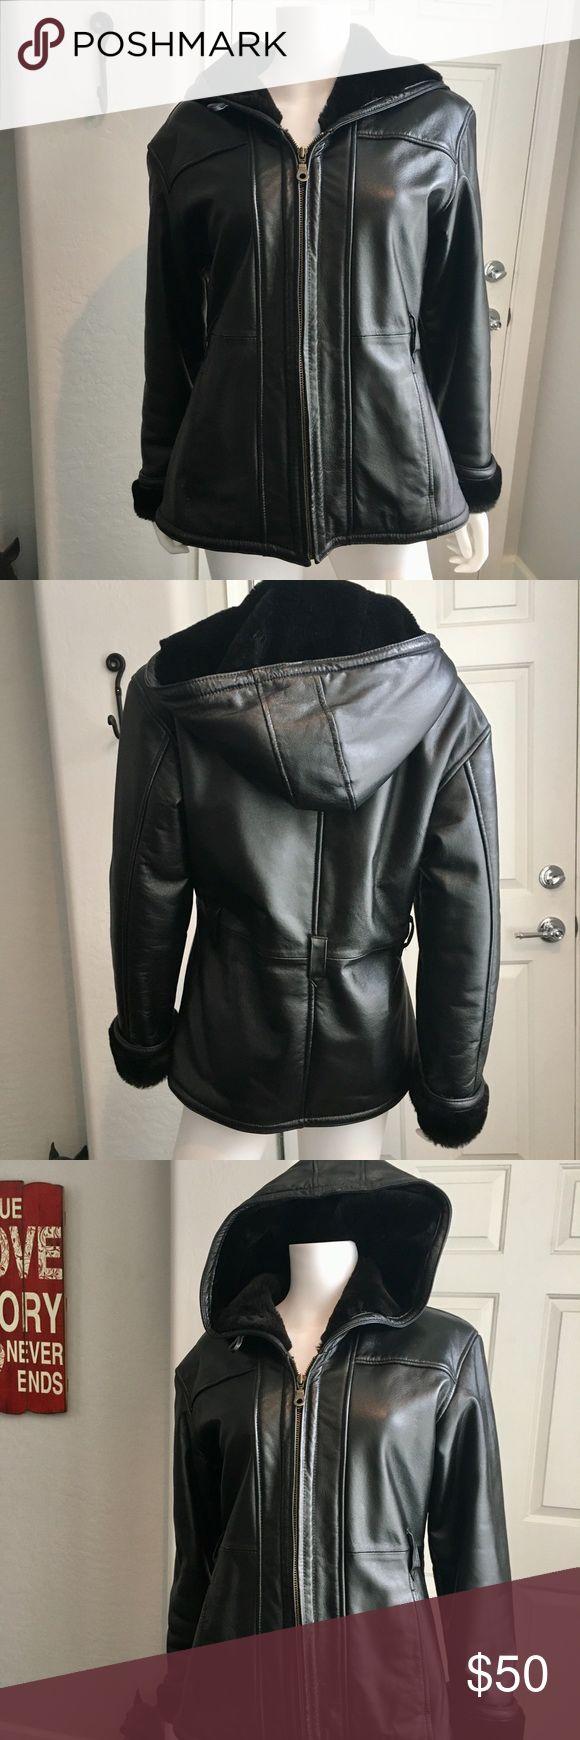 Wilson's Leather Women's Leather Jacket Coat EUC Excellent